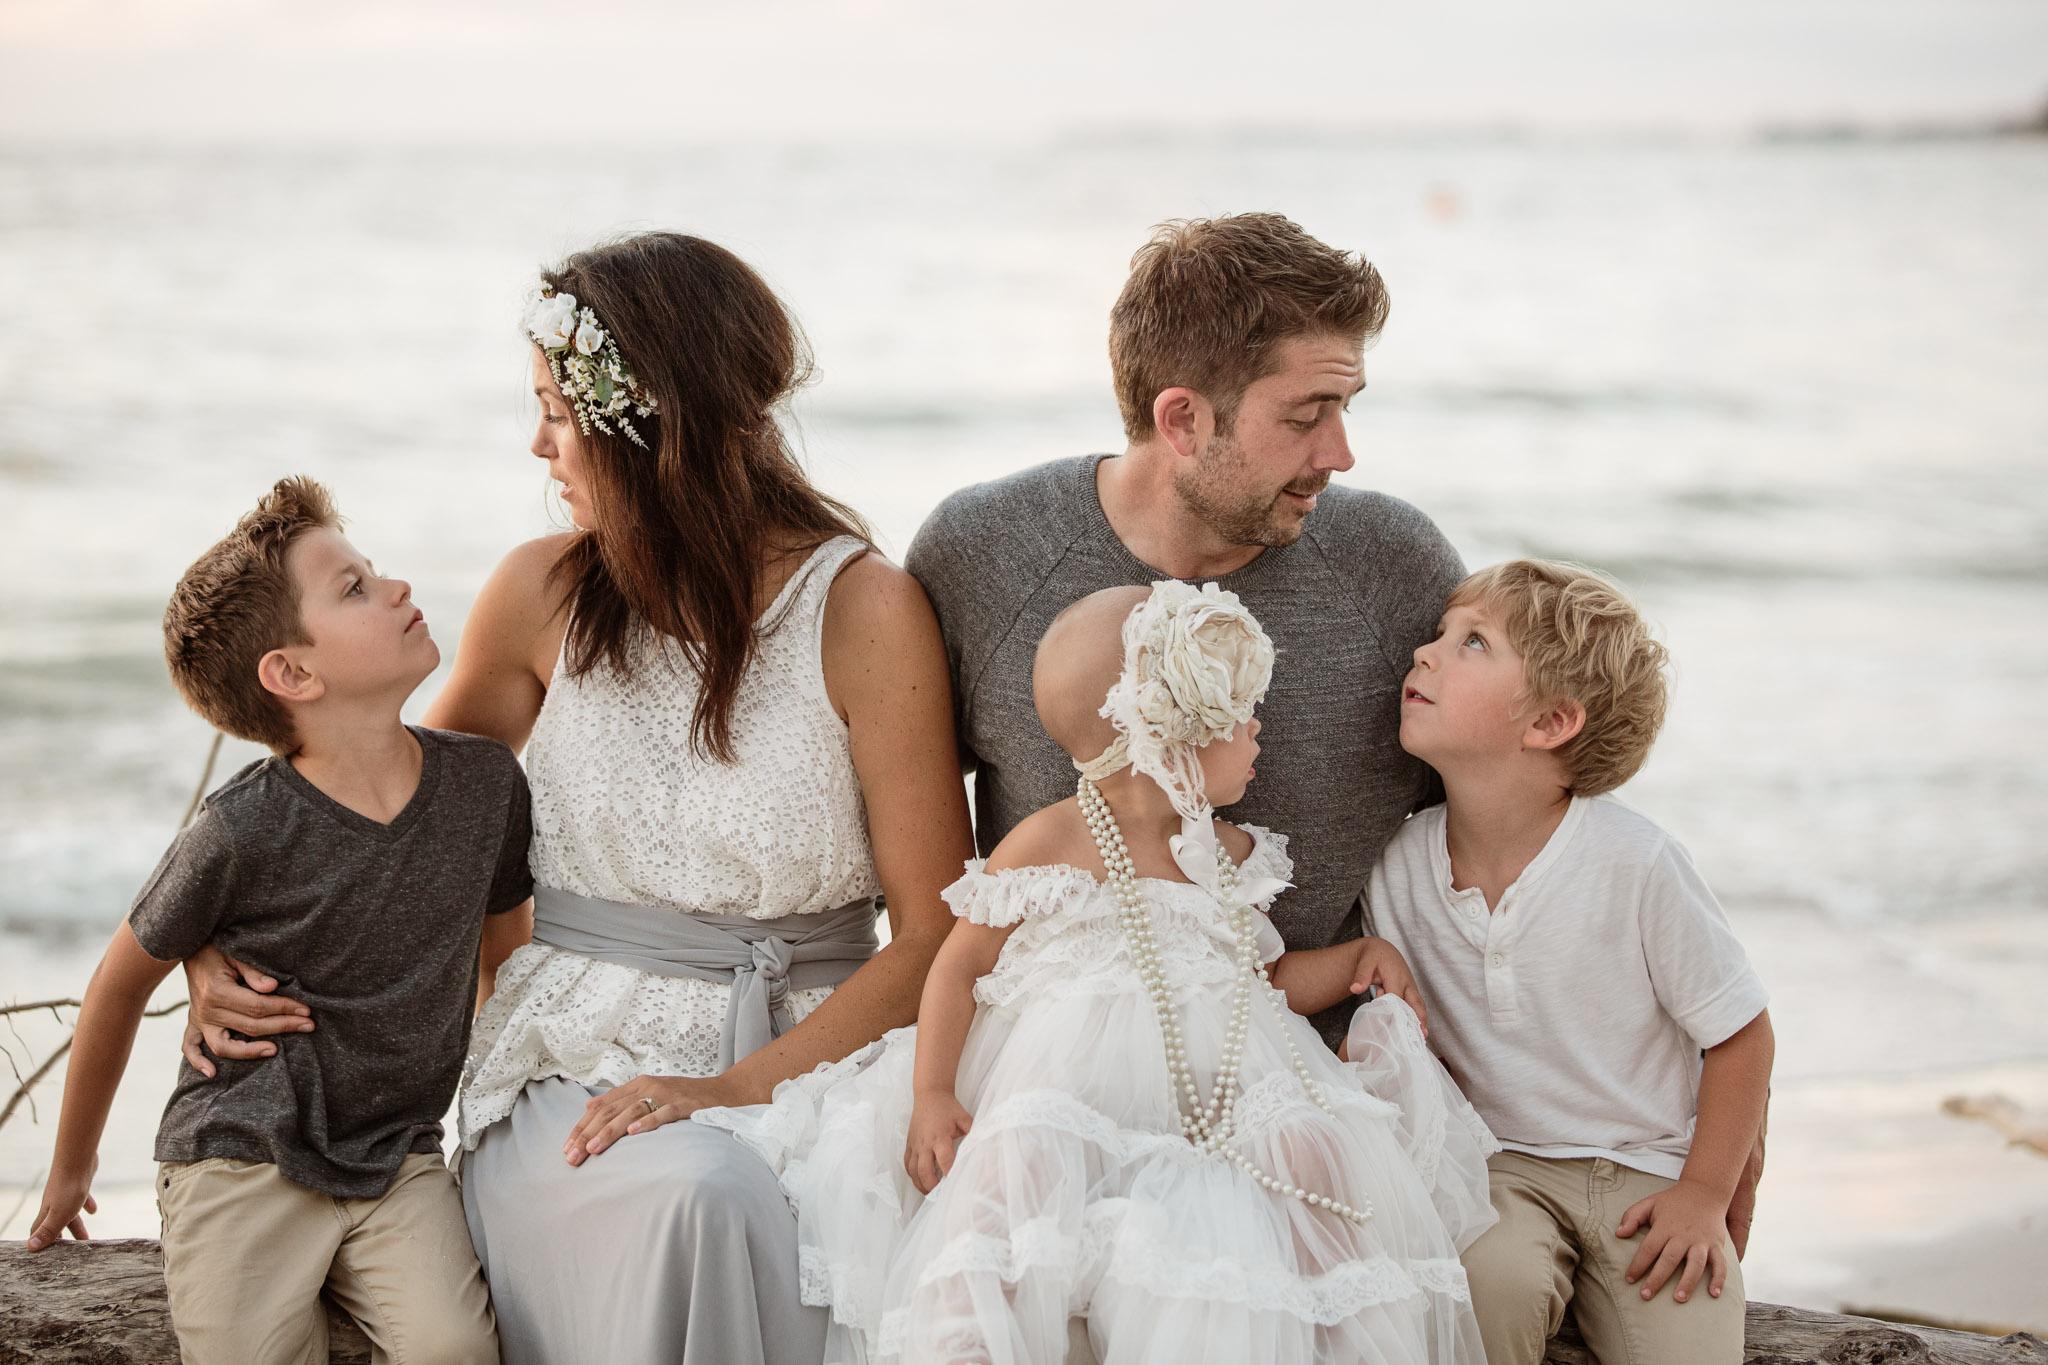 Mackay_Family_Sarasota_018.jpg